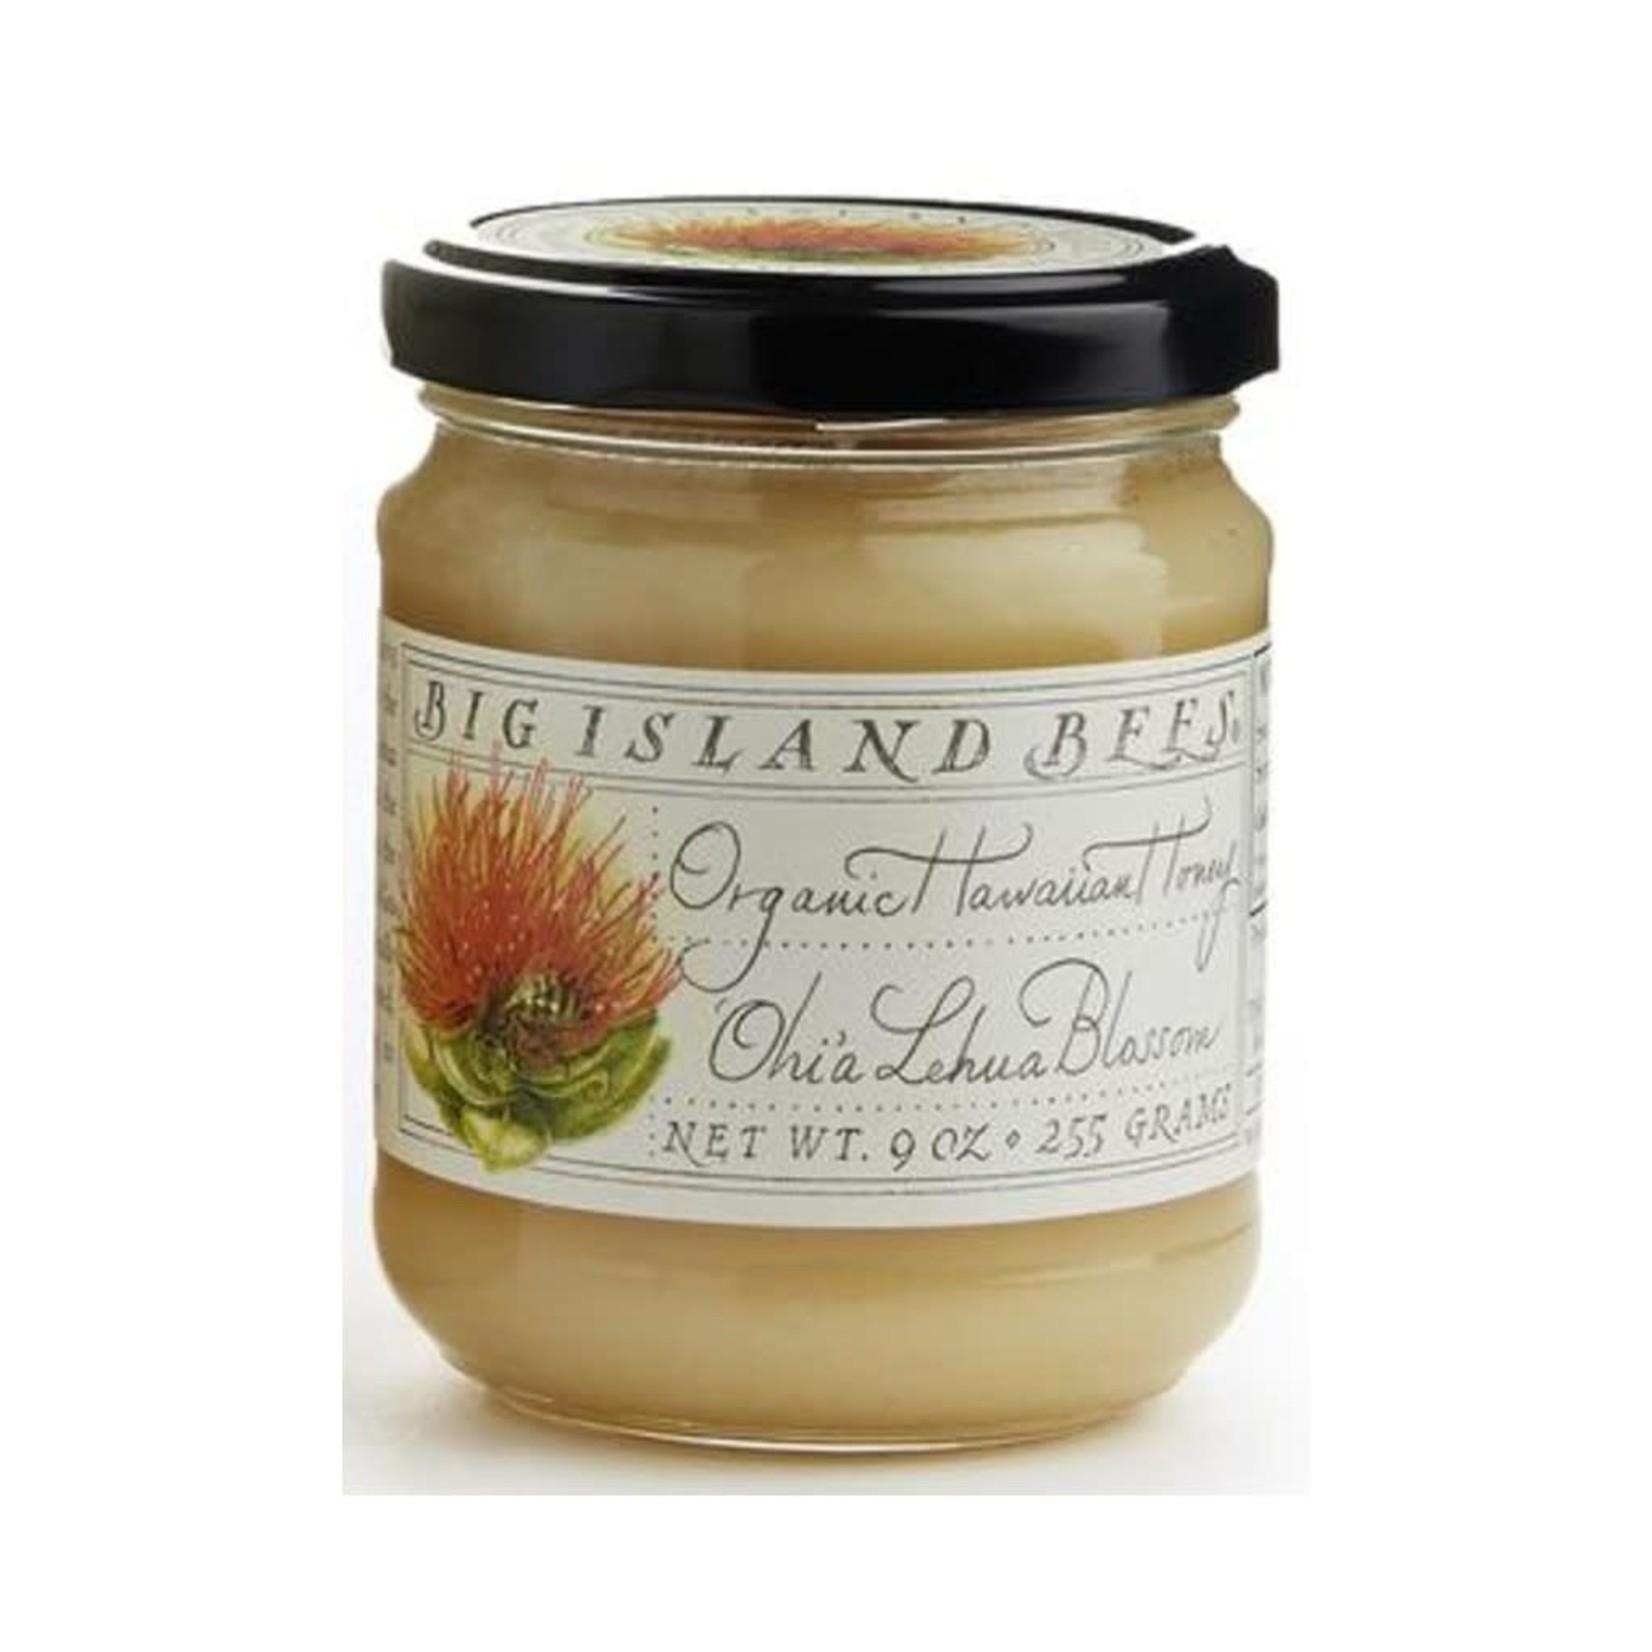 Big Island Bees Organic Lehua Honey, 9 oz.